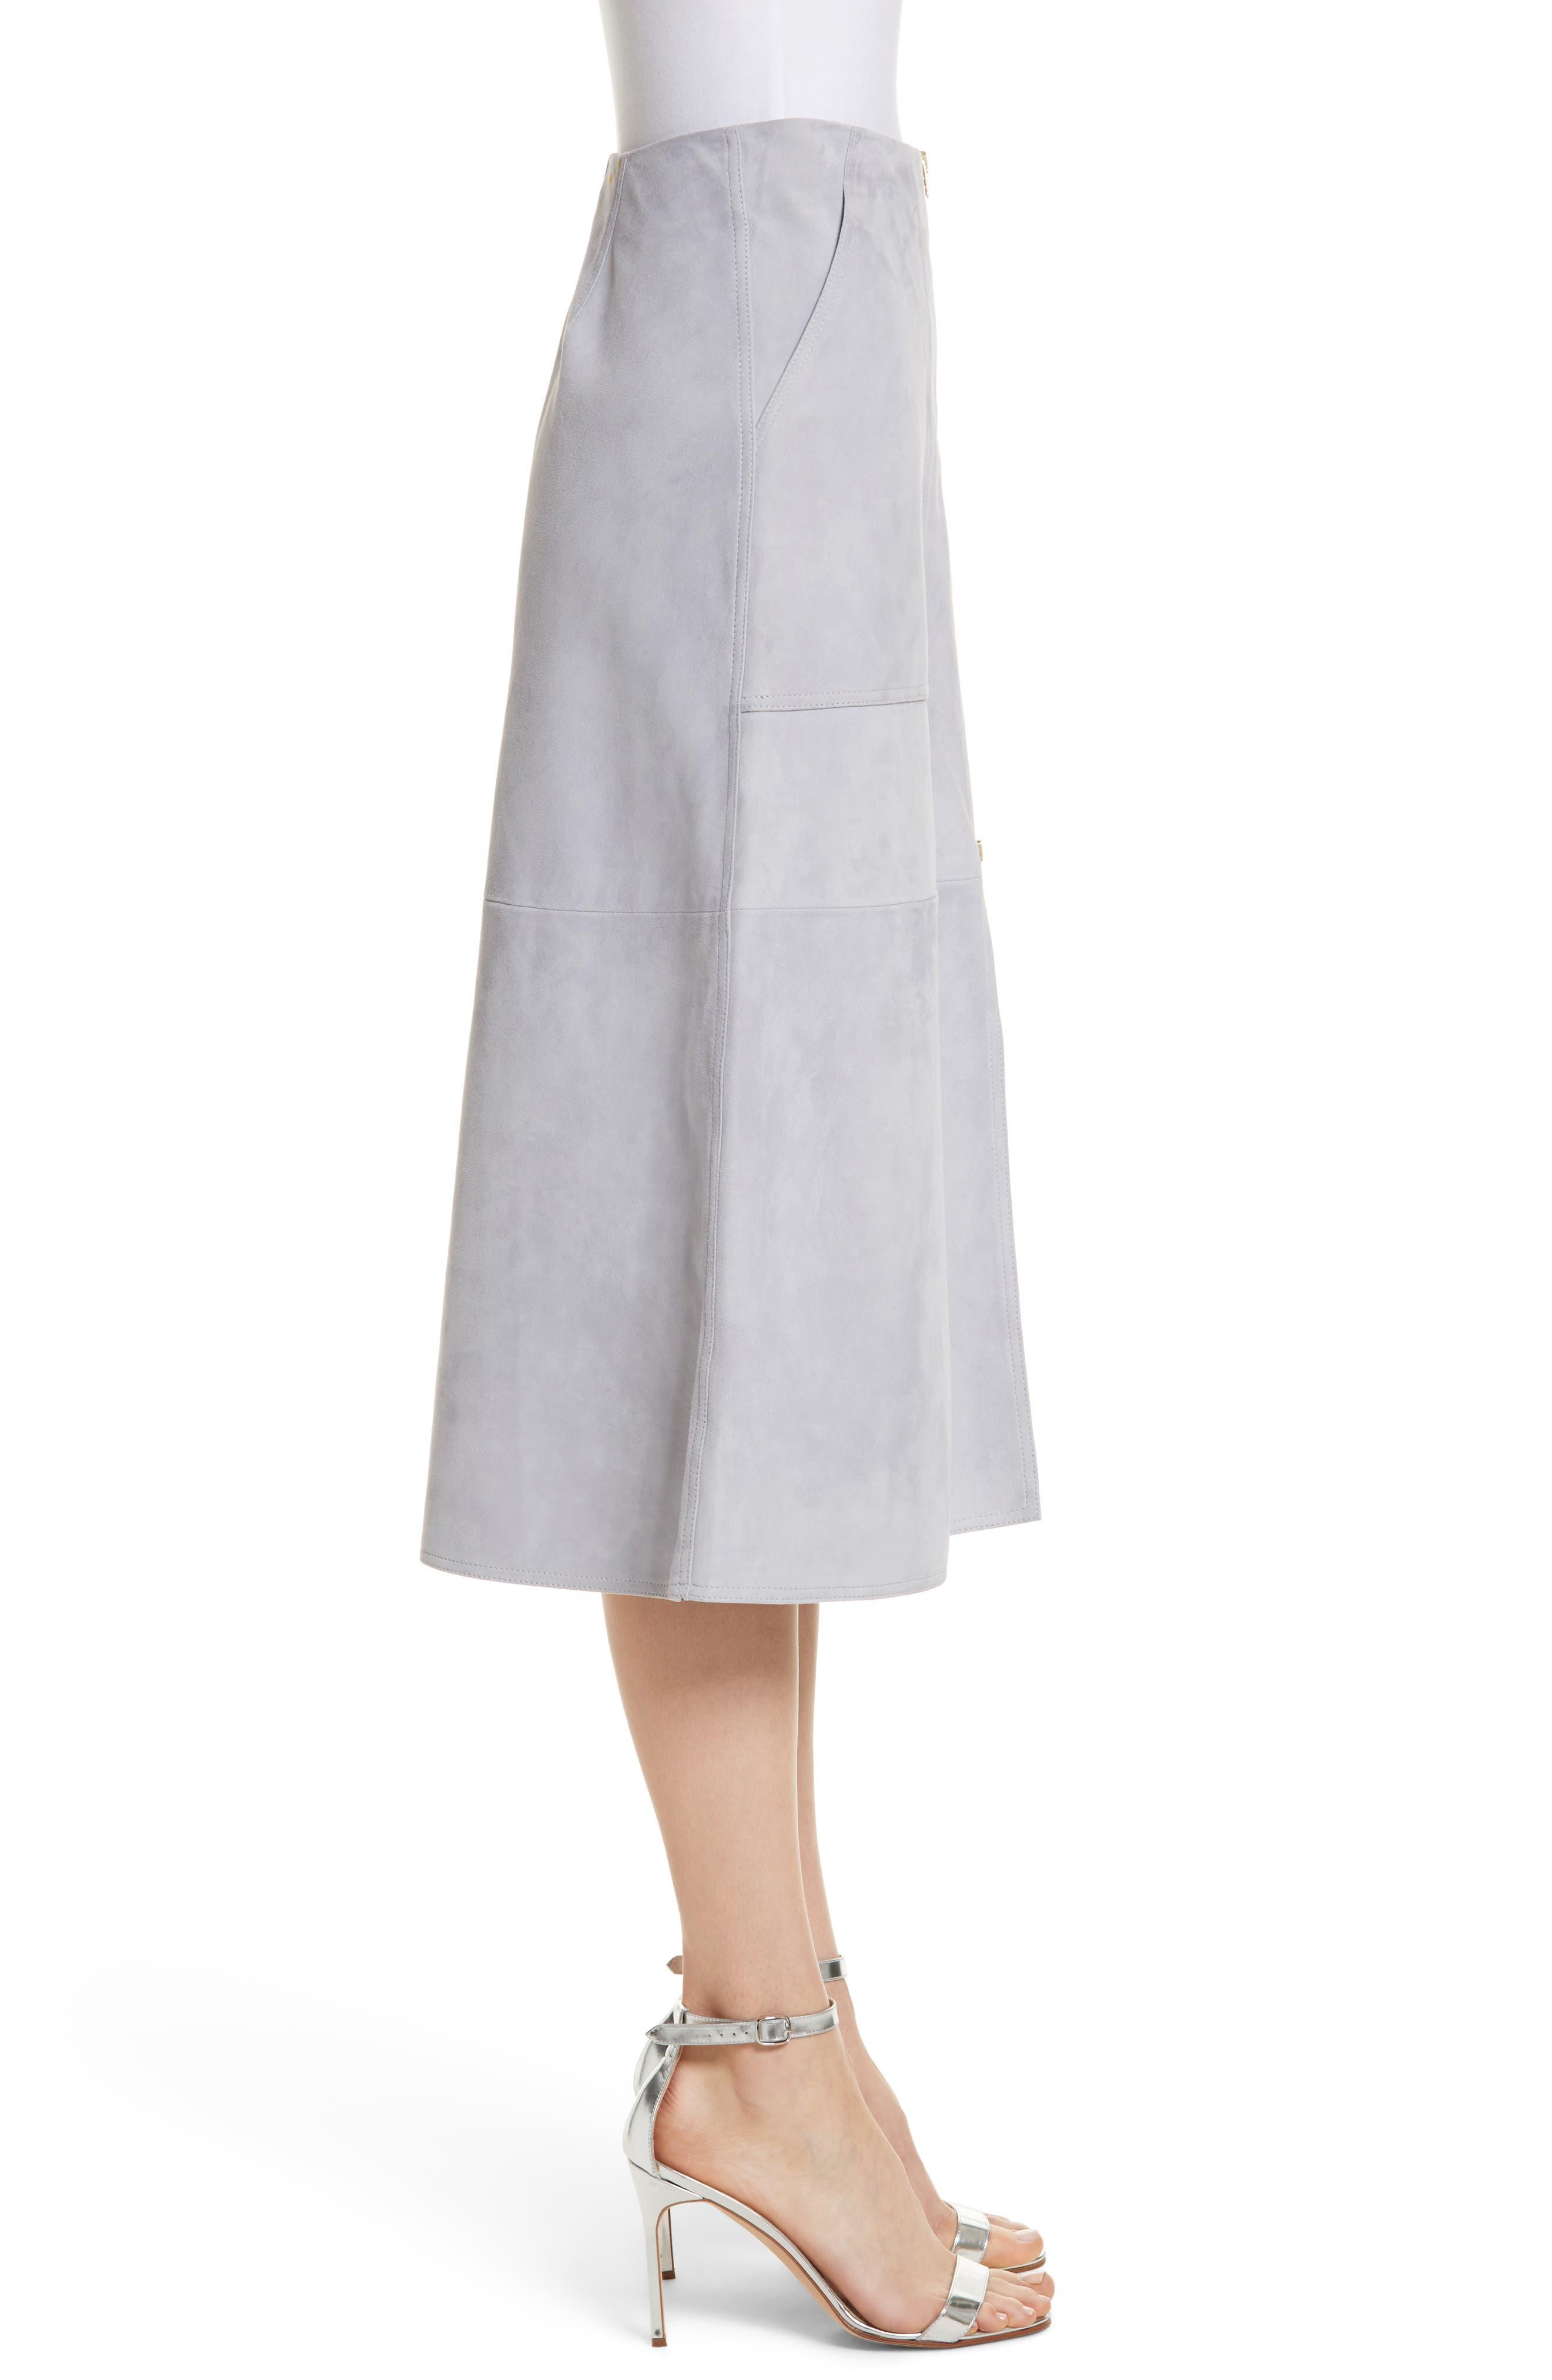 Diane von Furstenberg Patch Pocket Suede Midi Skirt,                             Alternate thumbnail 3, color,                             Smoke